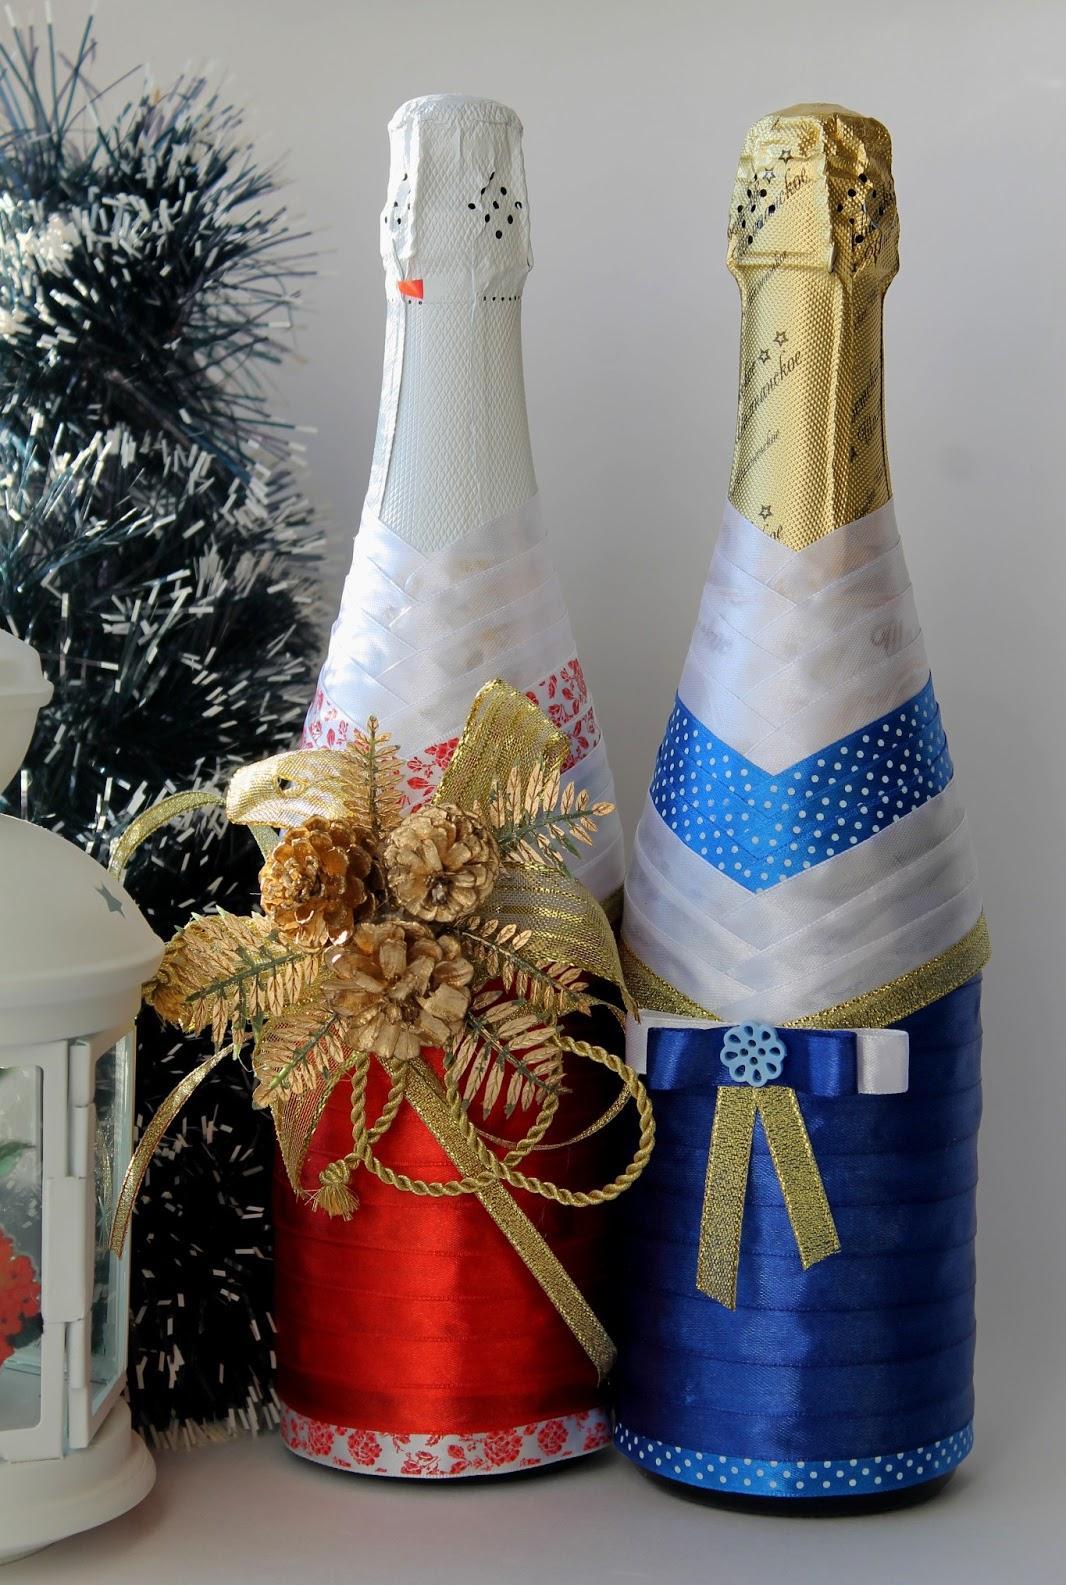 Botol hiasan christmas.